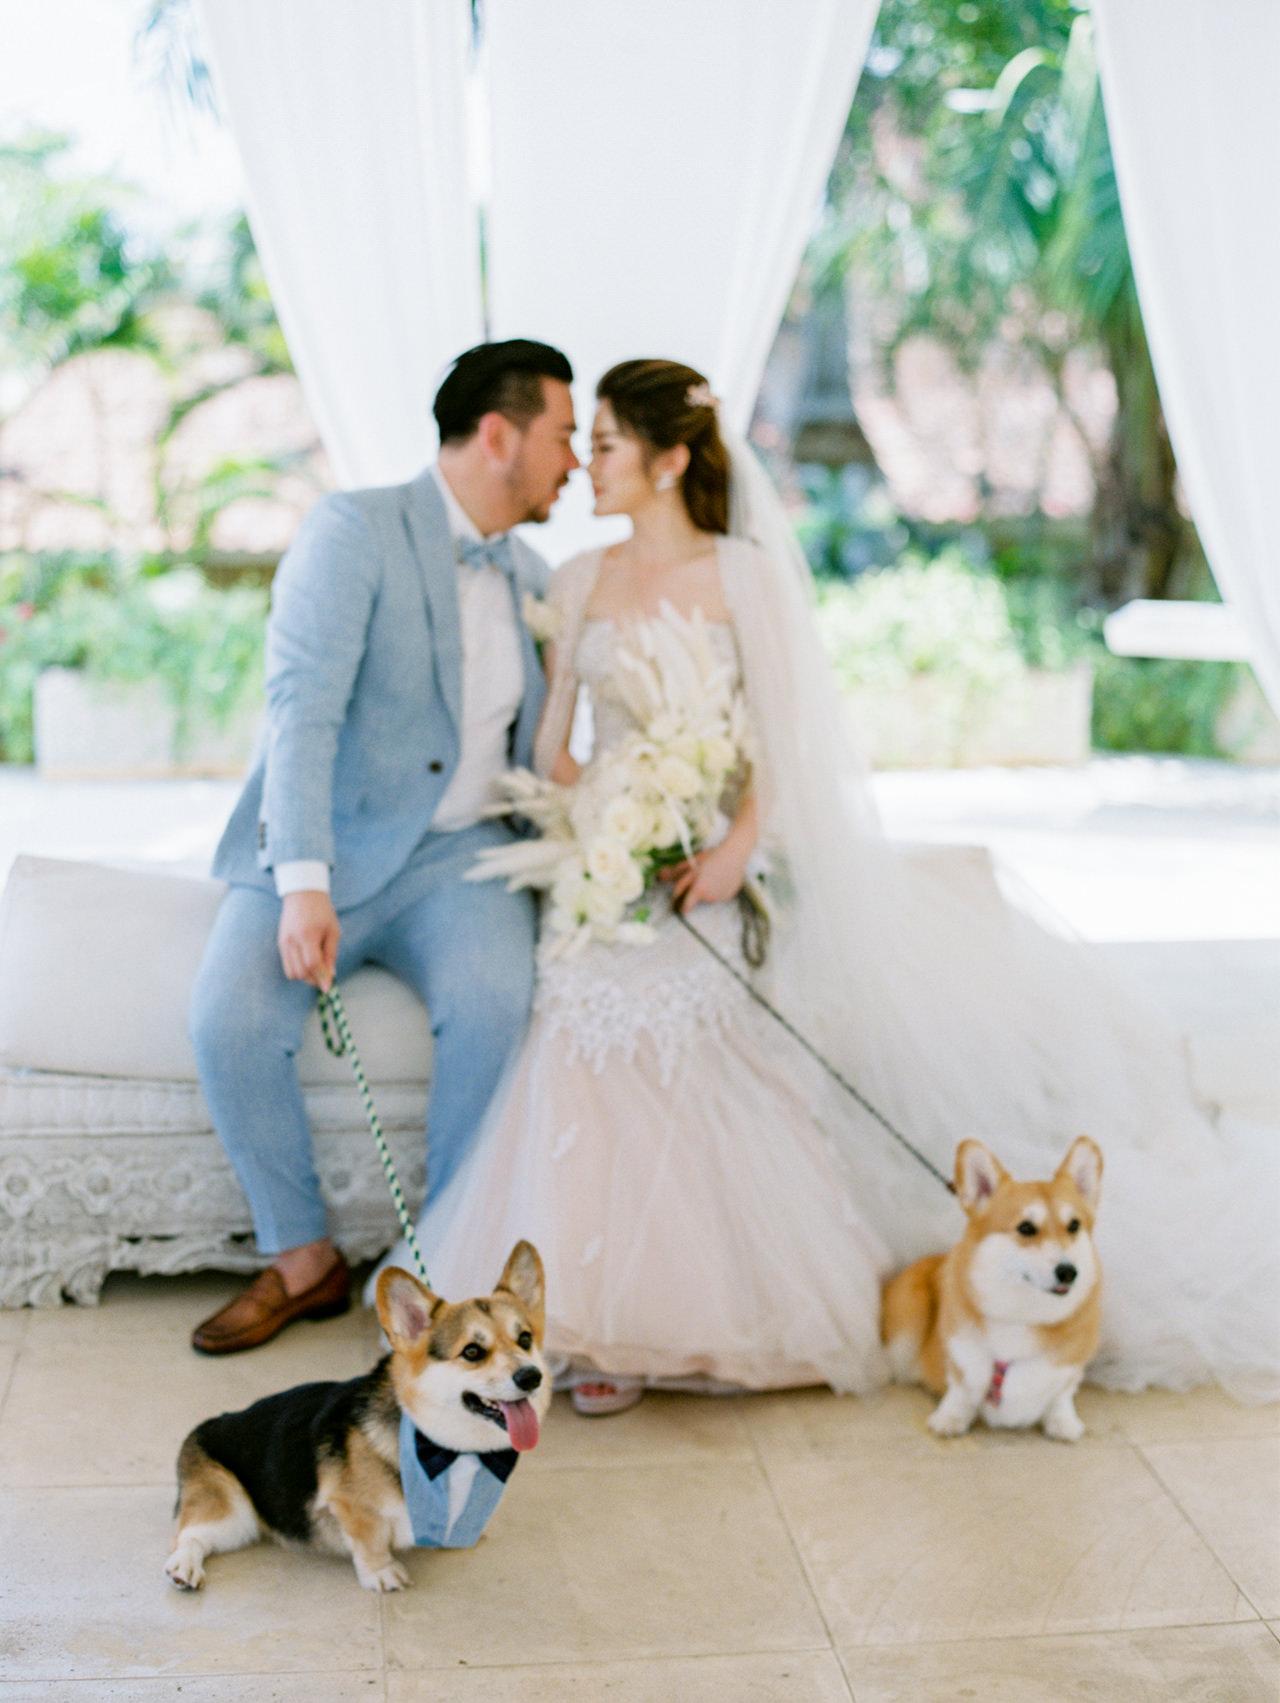 M&S: Shades of Blue Villa Plenilunio Bali Wedding 35